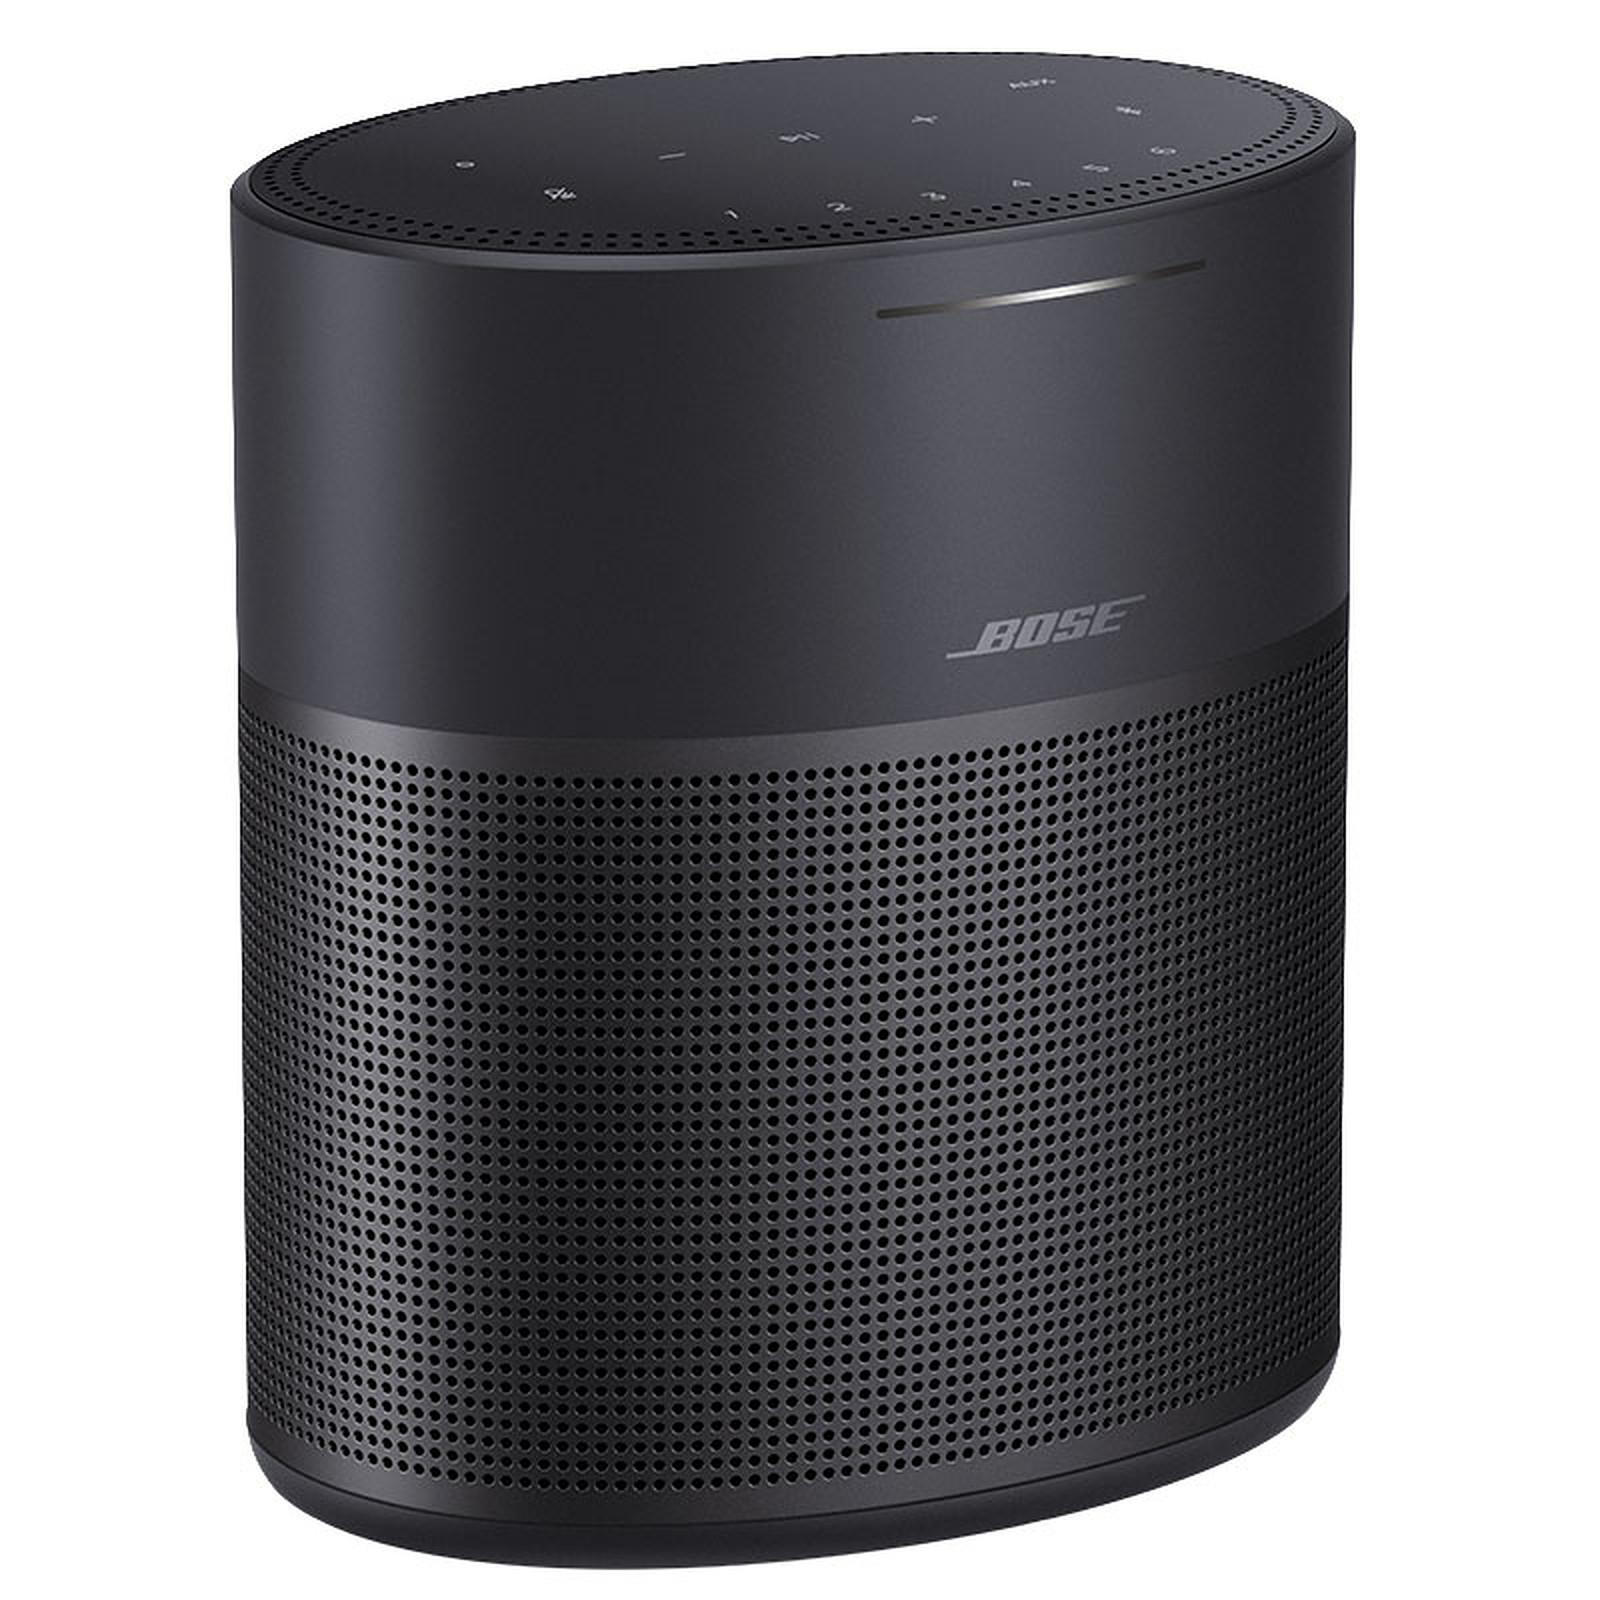 Enceinte sans fil multiroom Bose Home Speaker 300 - Noir (Alexa et Google Assistant)